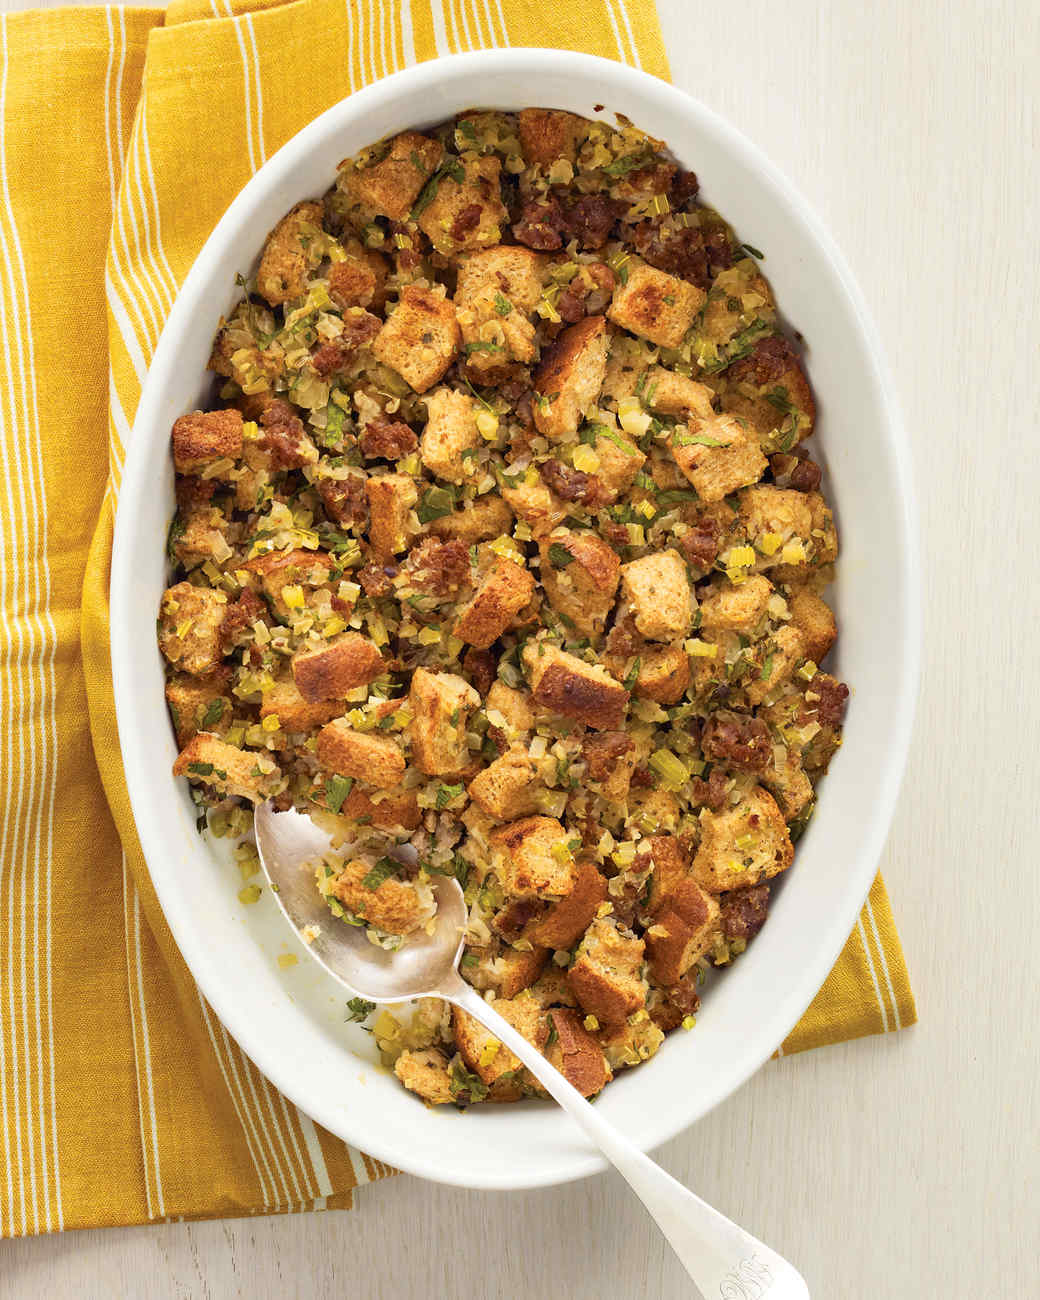 Whole-Wheat Stuffing with Turkey Sausage